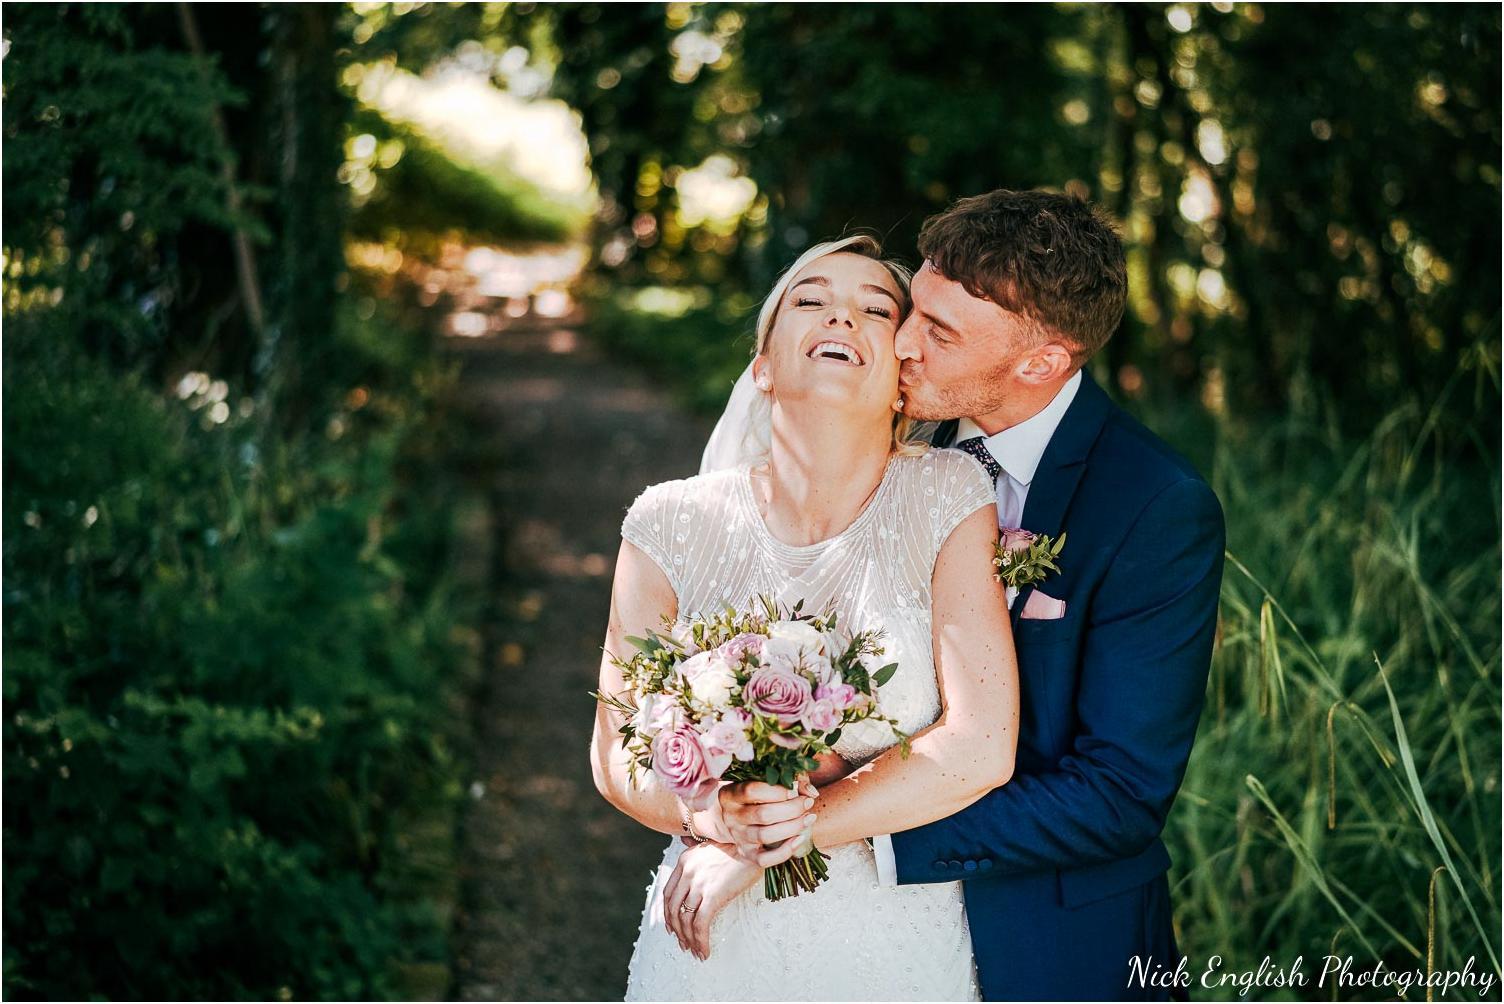 Mitton_Hall_Wedding_Photograph-98.jpg